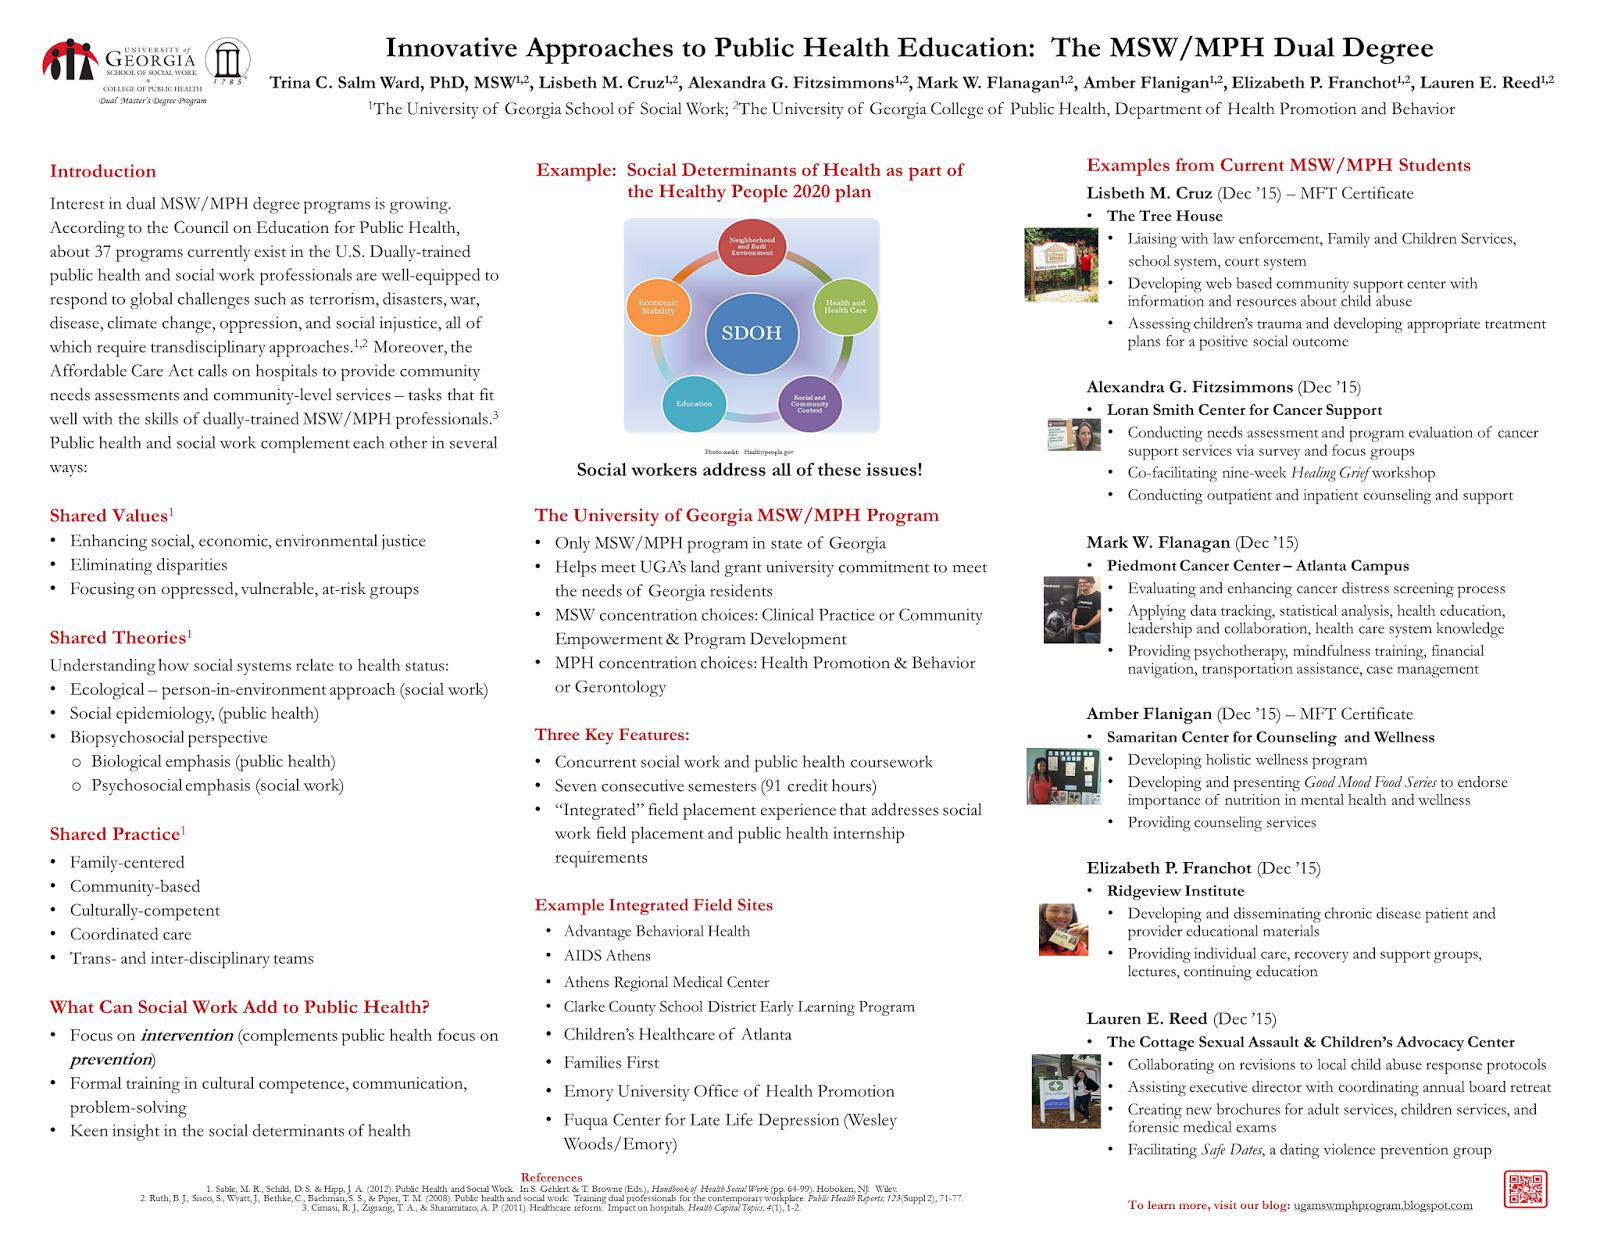 The University of Georgia Dual MSW MPH Program: 2015